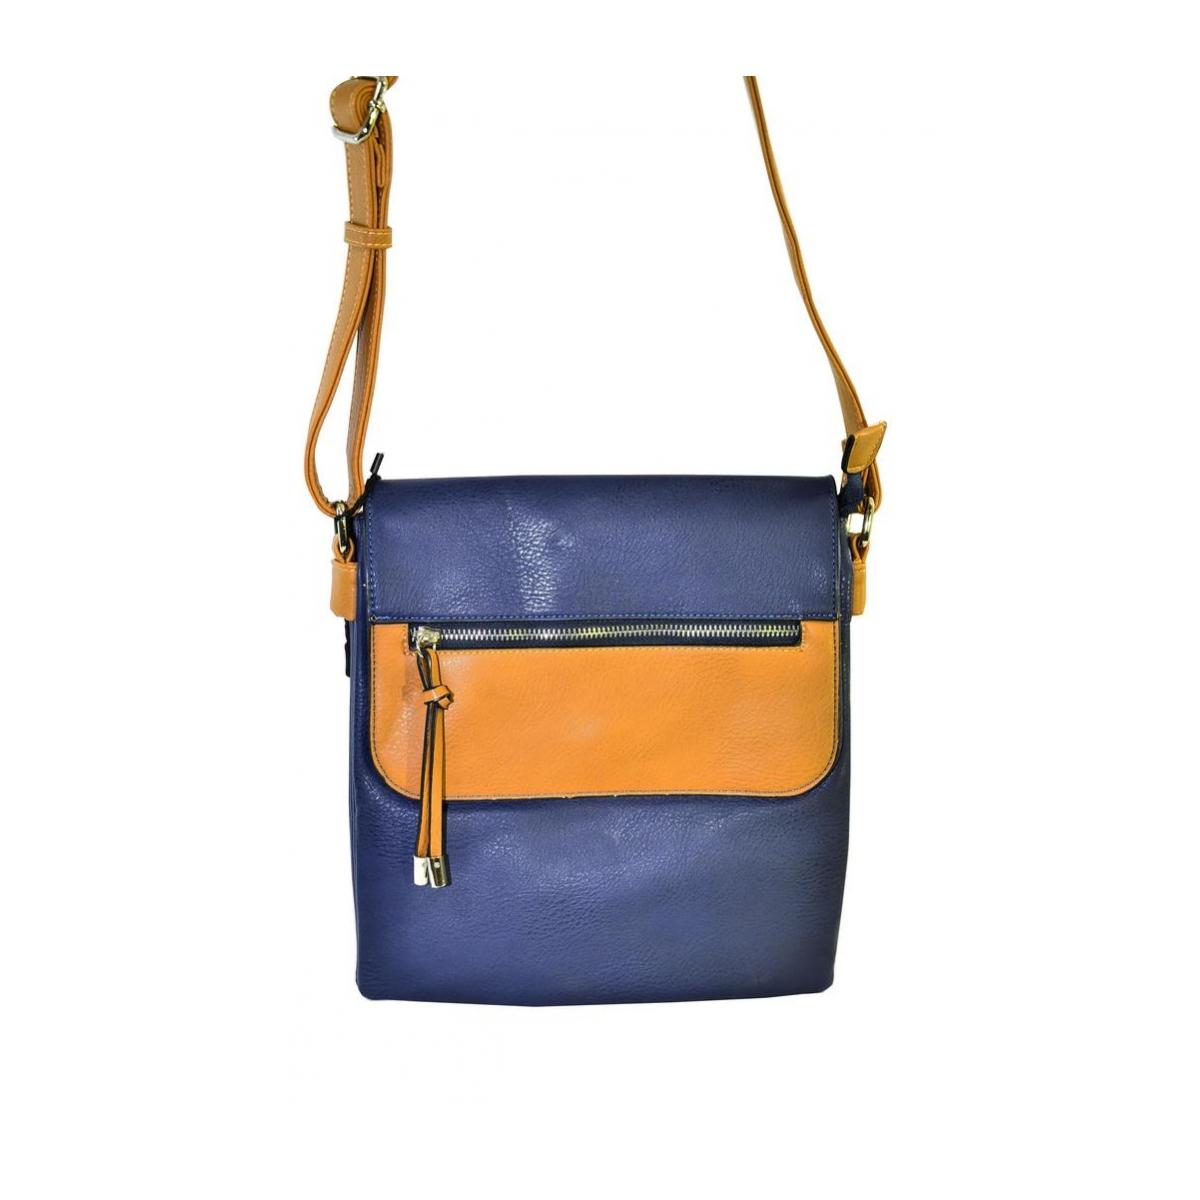 Modro-hnedá kabelka RIGUEZ - 2 f420a39d20a